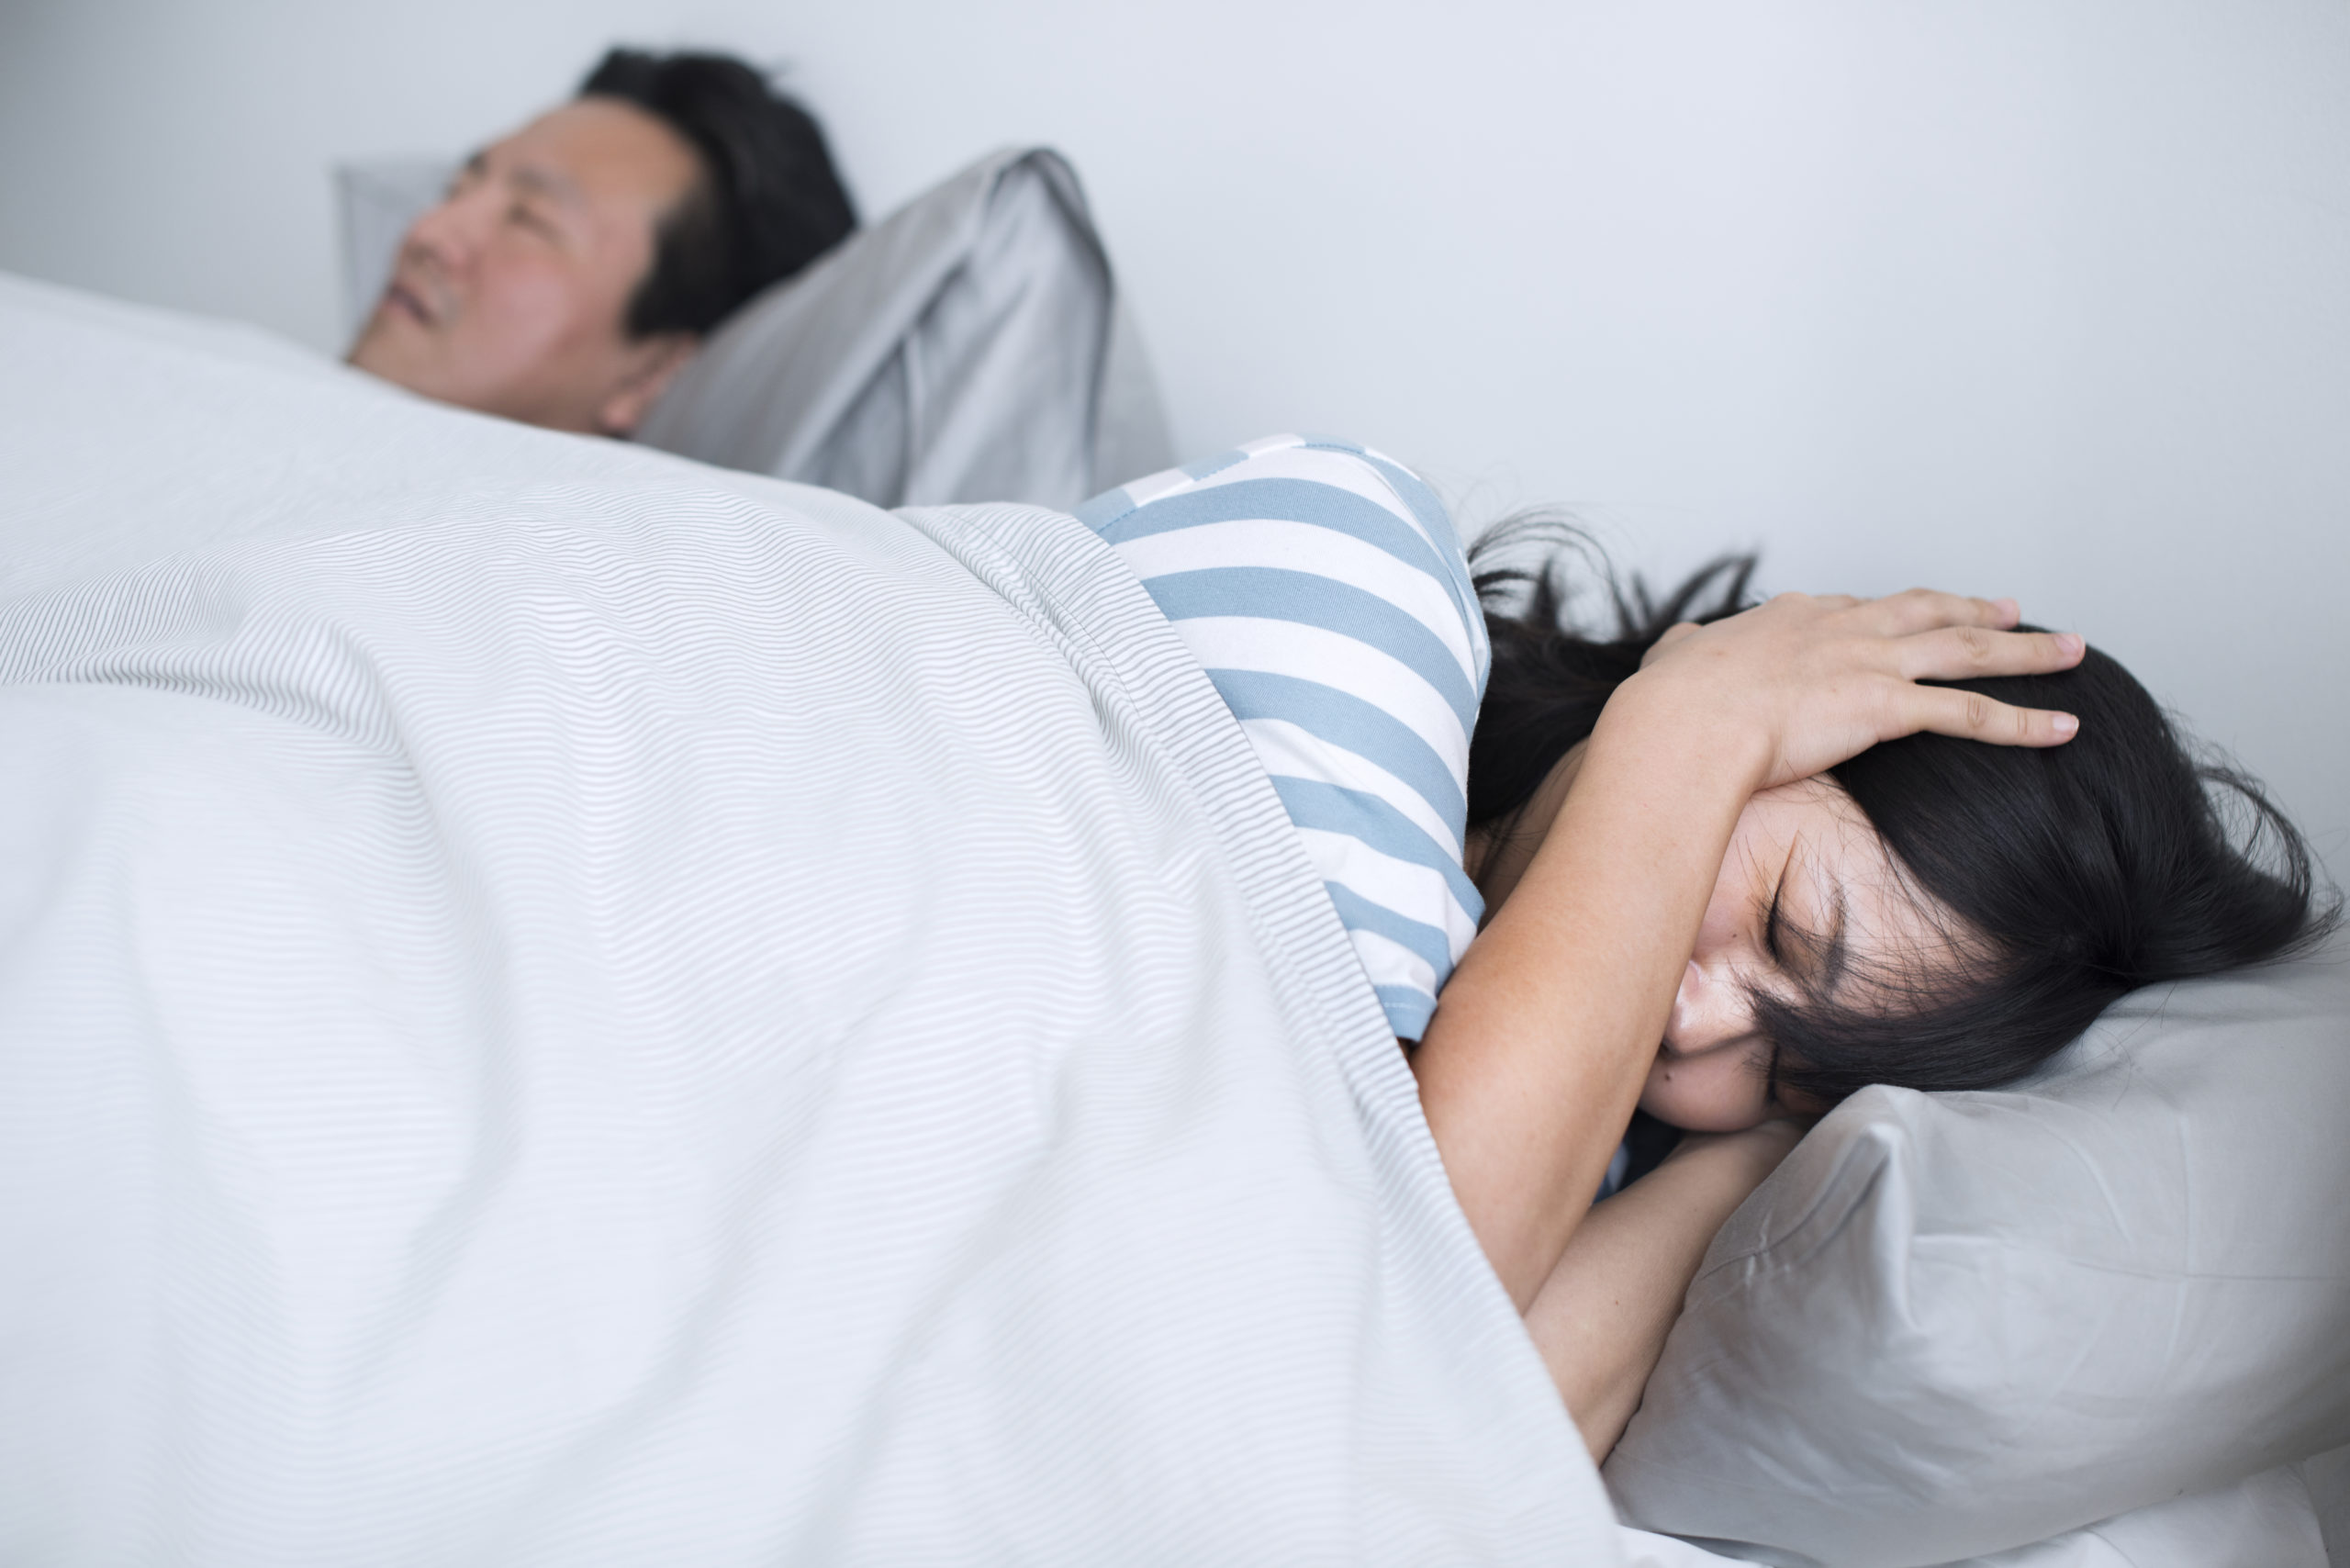 Husband disrupting wife's sleep with his loud snoring